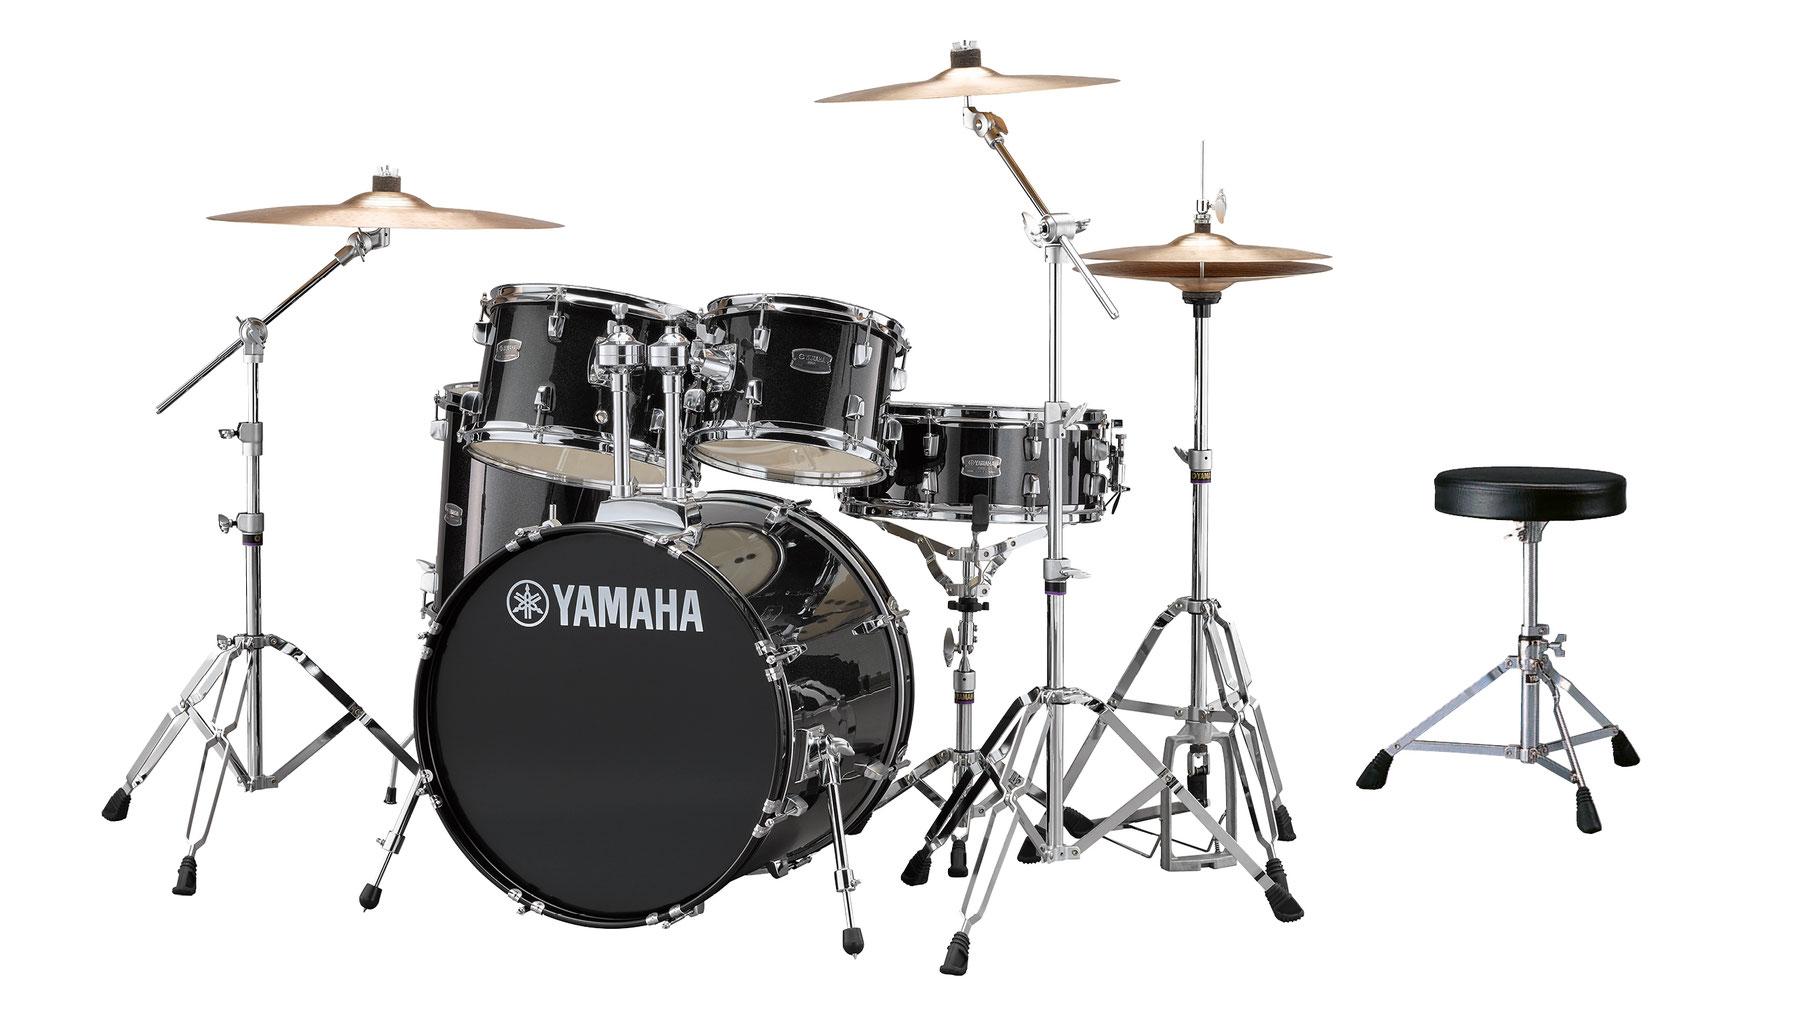 rydeen yamaha drum kits yamaha music mackay. Black Bedroom Furniture Sets. Home Design Ideas